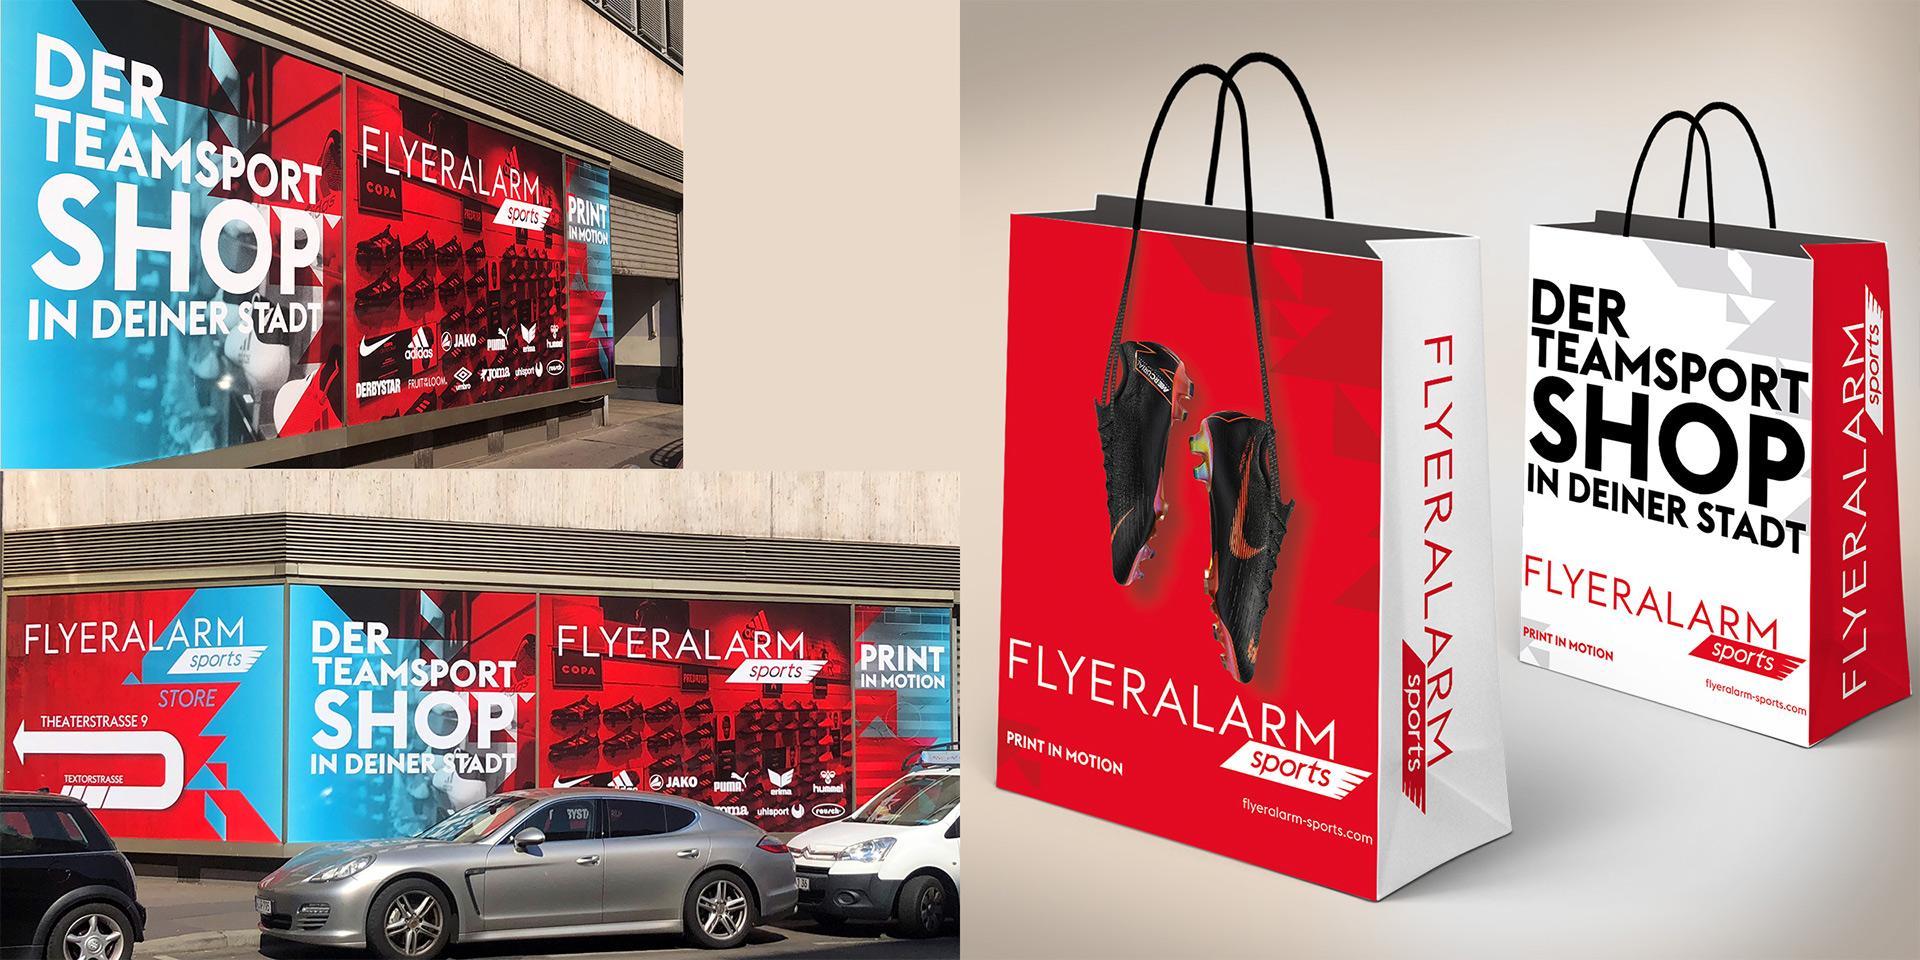 9 gfd gregor fenger designworks for fa sports de branding corporate design smm sma social media marketing online